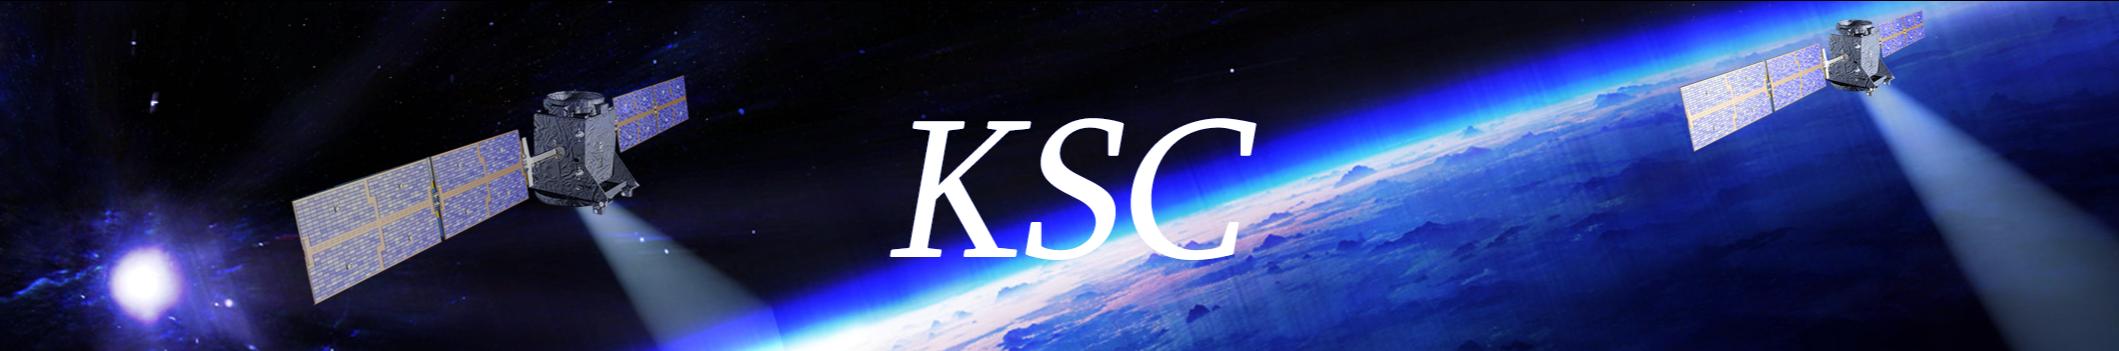 KSC Embleem